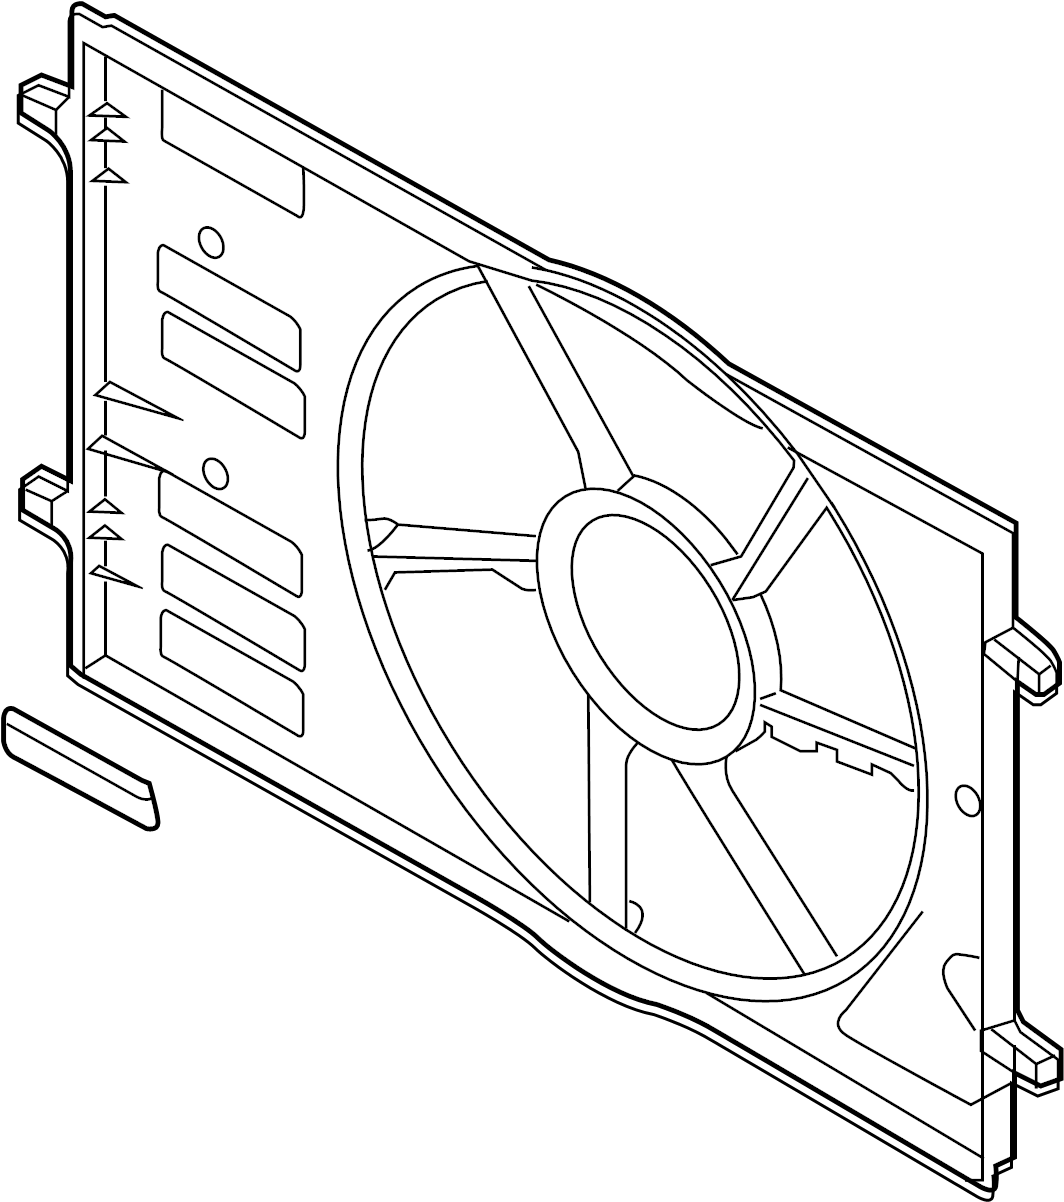 Volkswagen Sportwagen Radiator Shutter Assembly